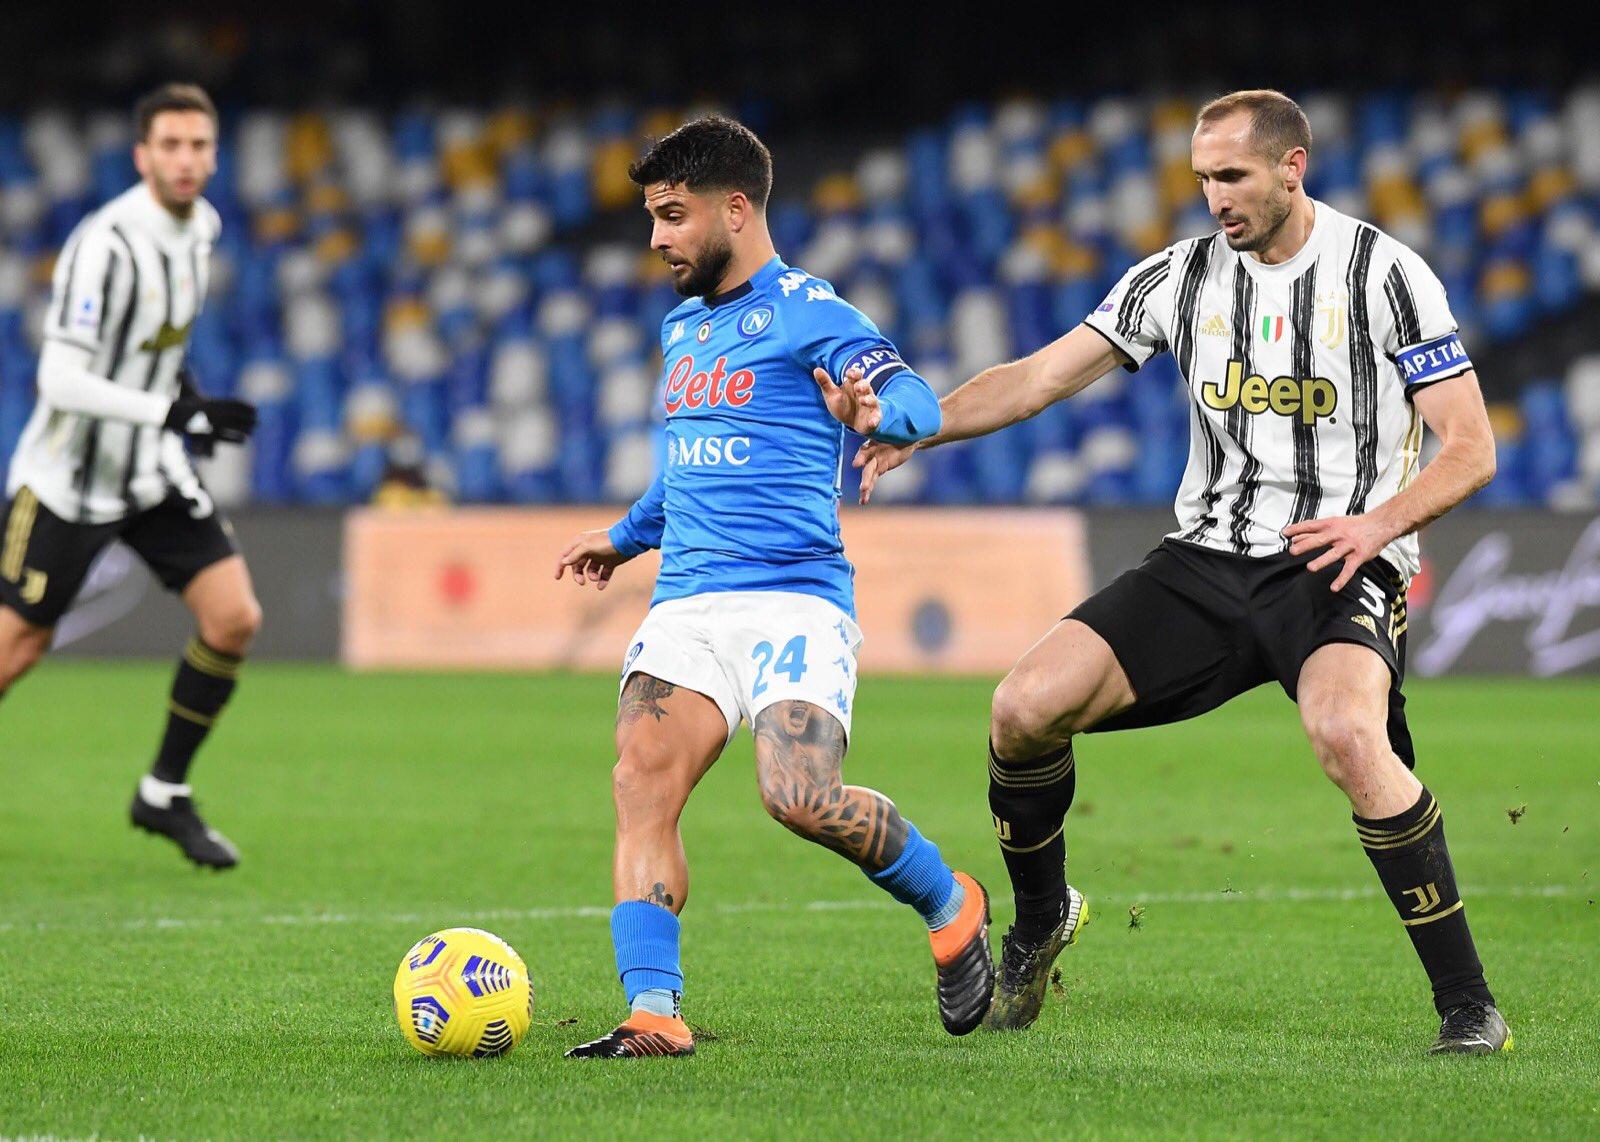 Juventus-Napoli, le formazioni ufficiali: Meret e Rrahmani titolari, Osimhen in panchina